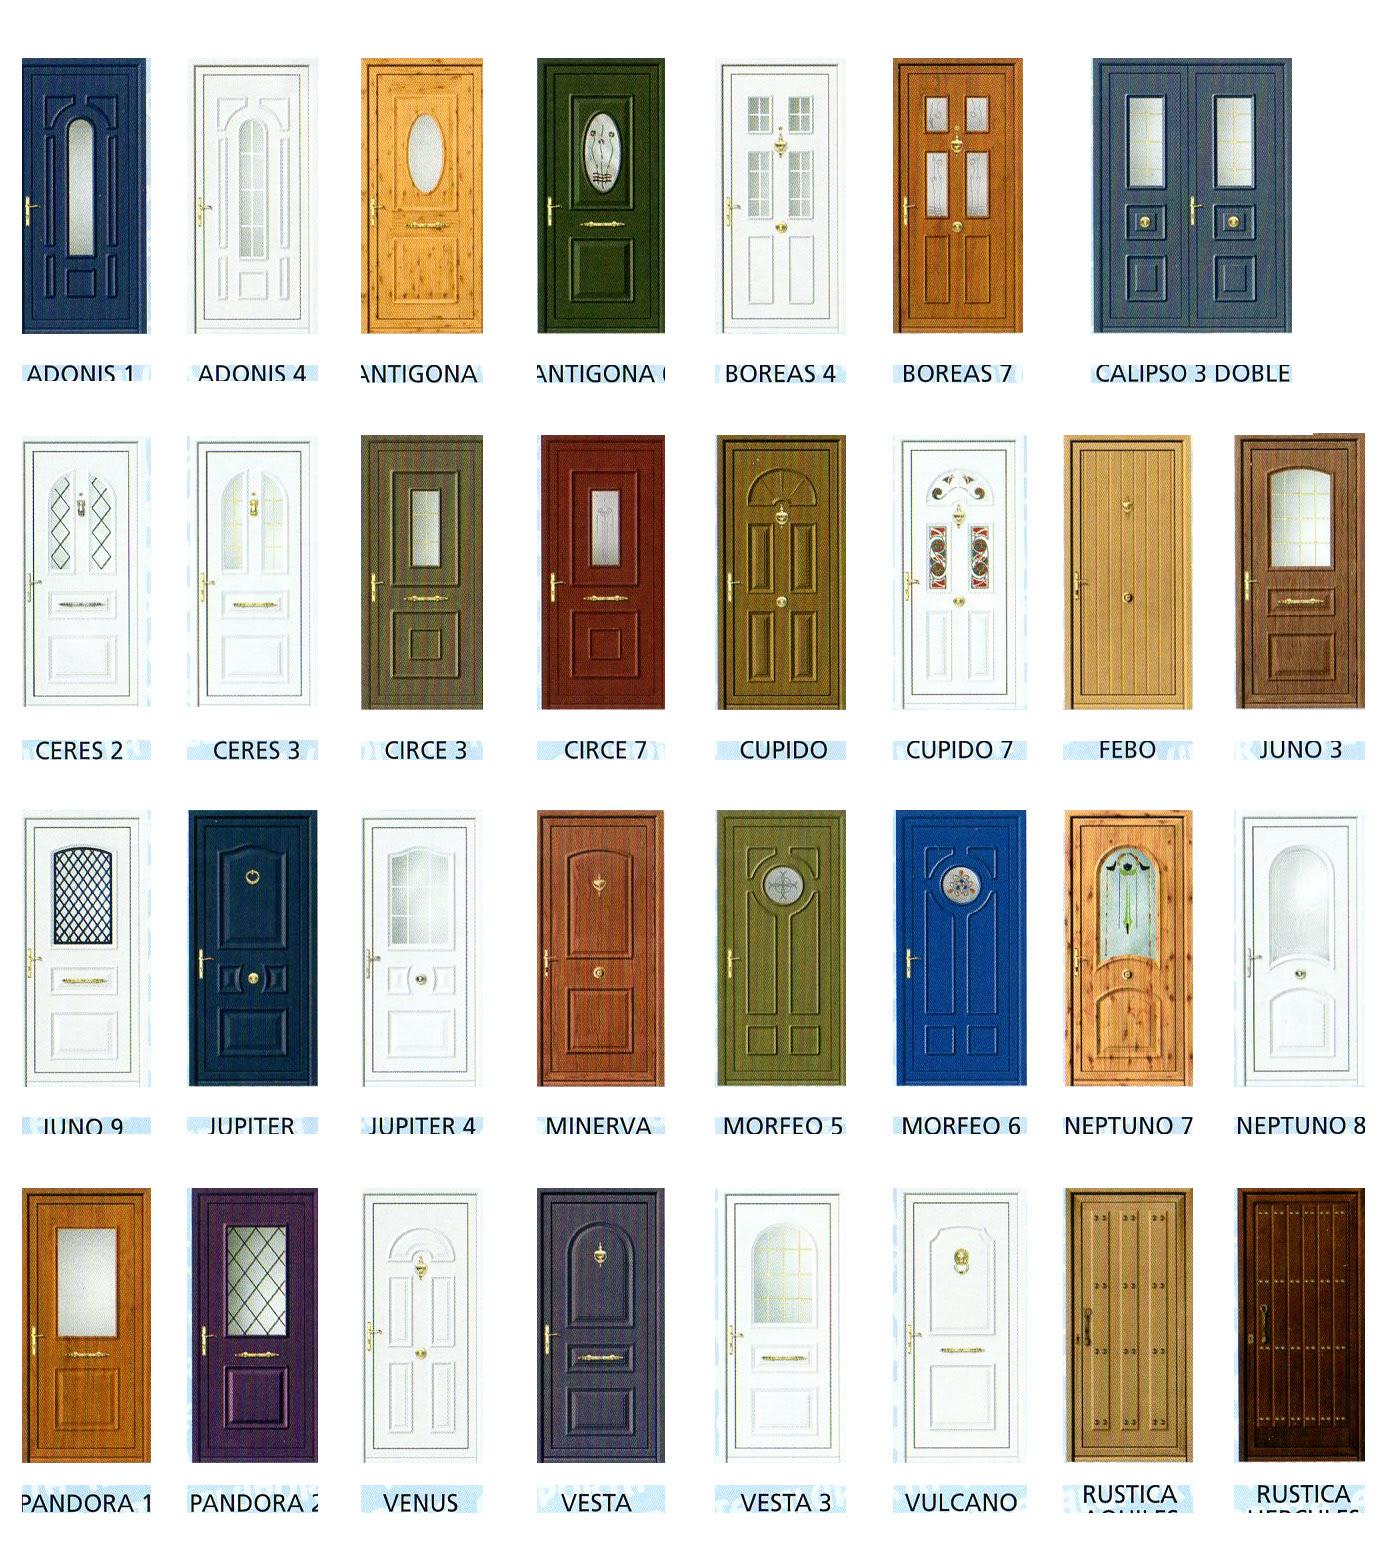 Dormitorio muebles modernos puertas aluminio catalogo for Precios de puertas de exterior aluminio